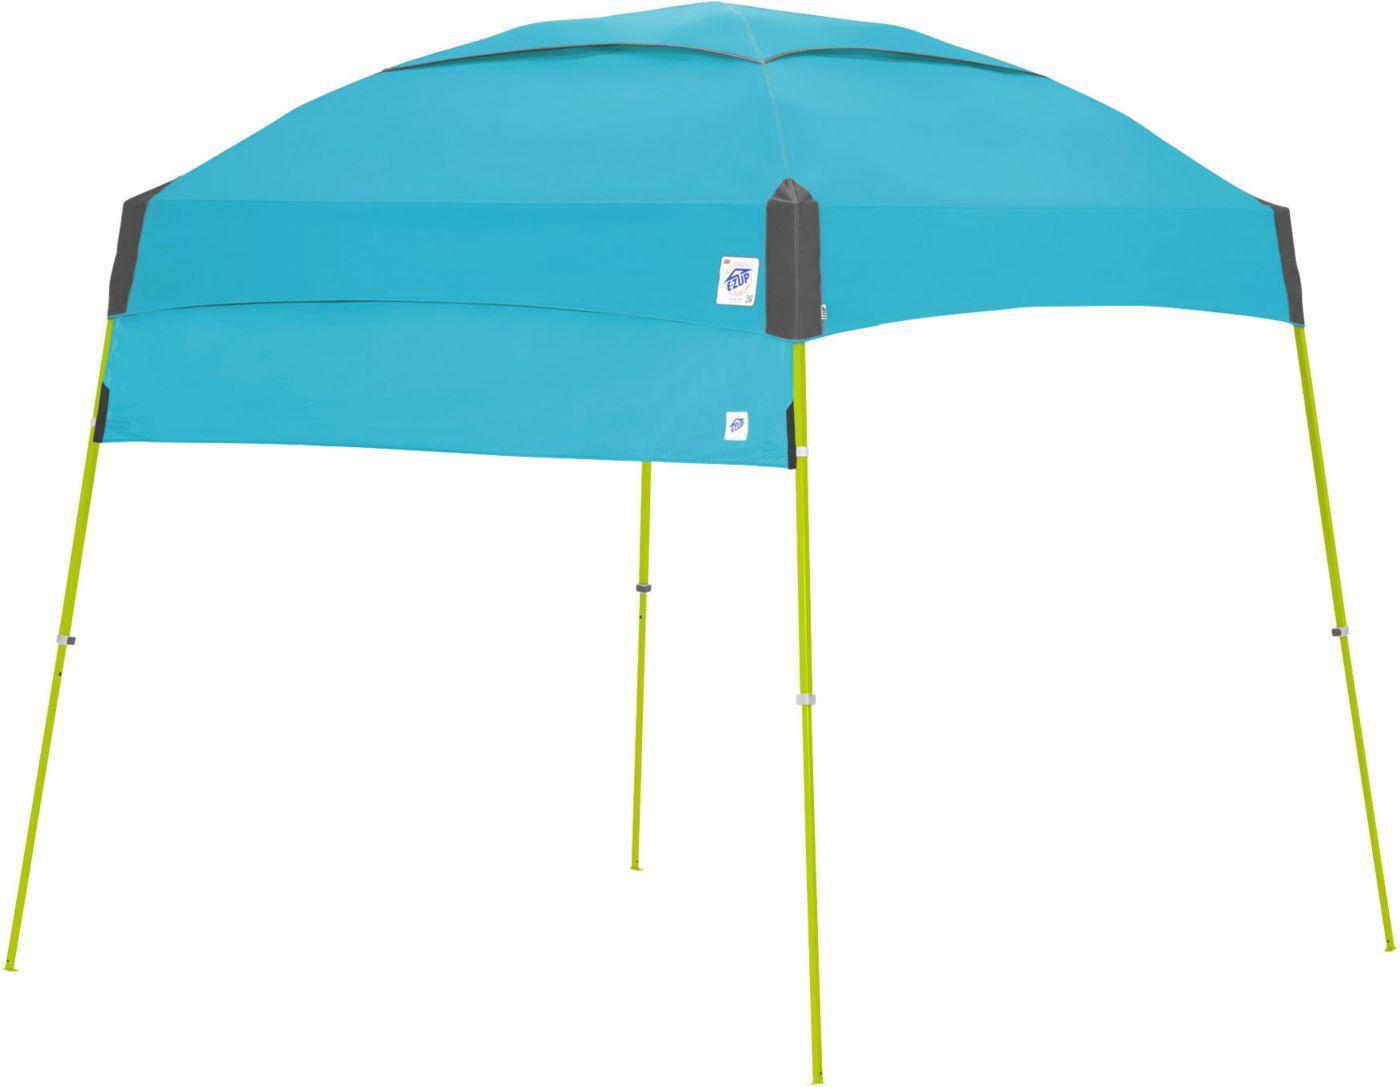 E-Z UP 10' Angle Leg Instant Half Wall